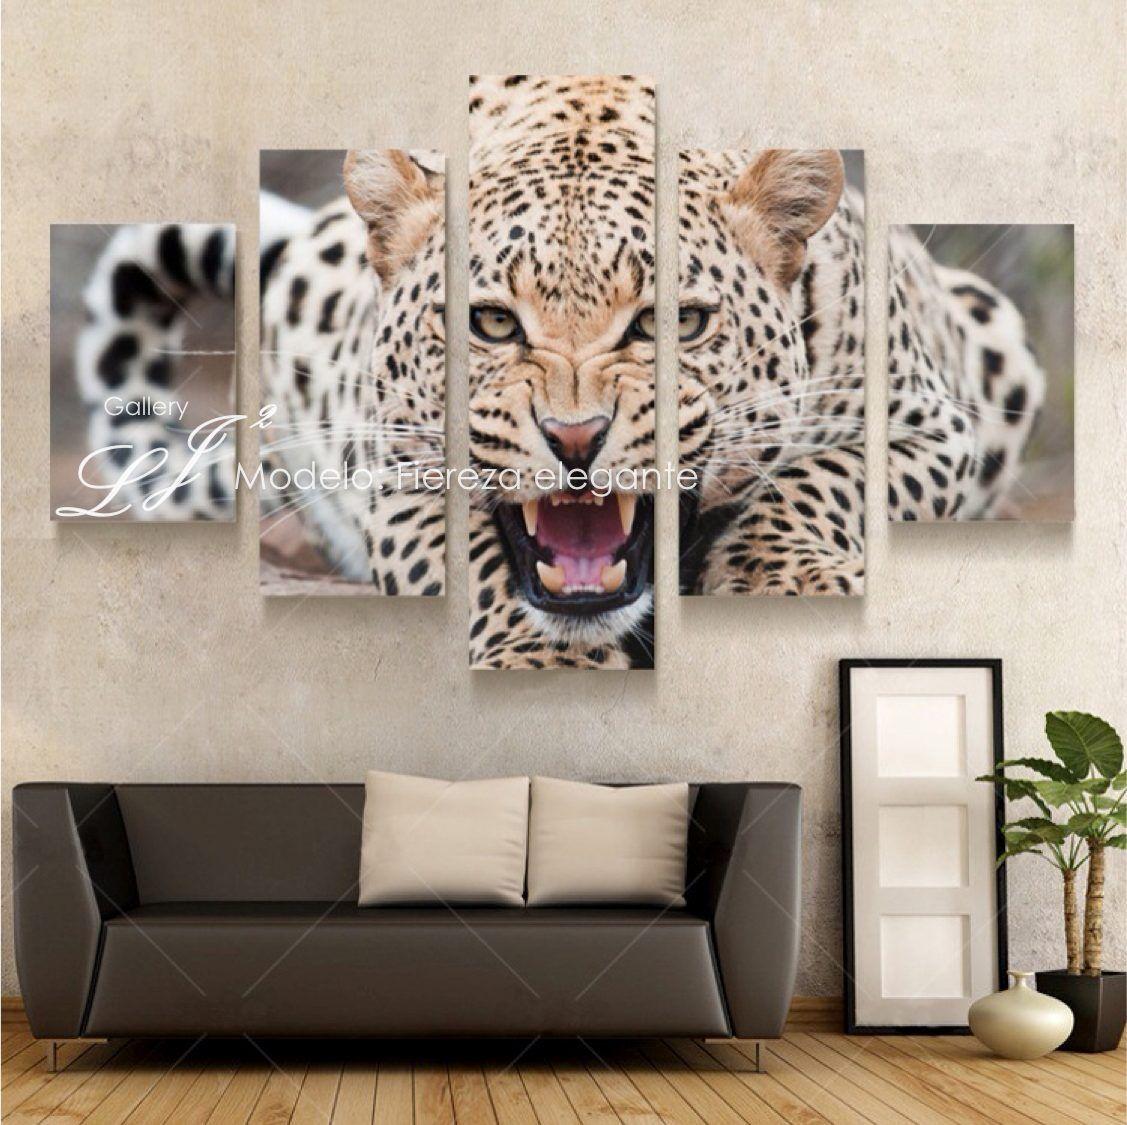 resultado de imagen para cuadros modernos decorativos para sala rocalla pinterest lion. Black Bedroom Furniture Sets. Home Design Ideas